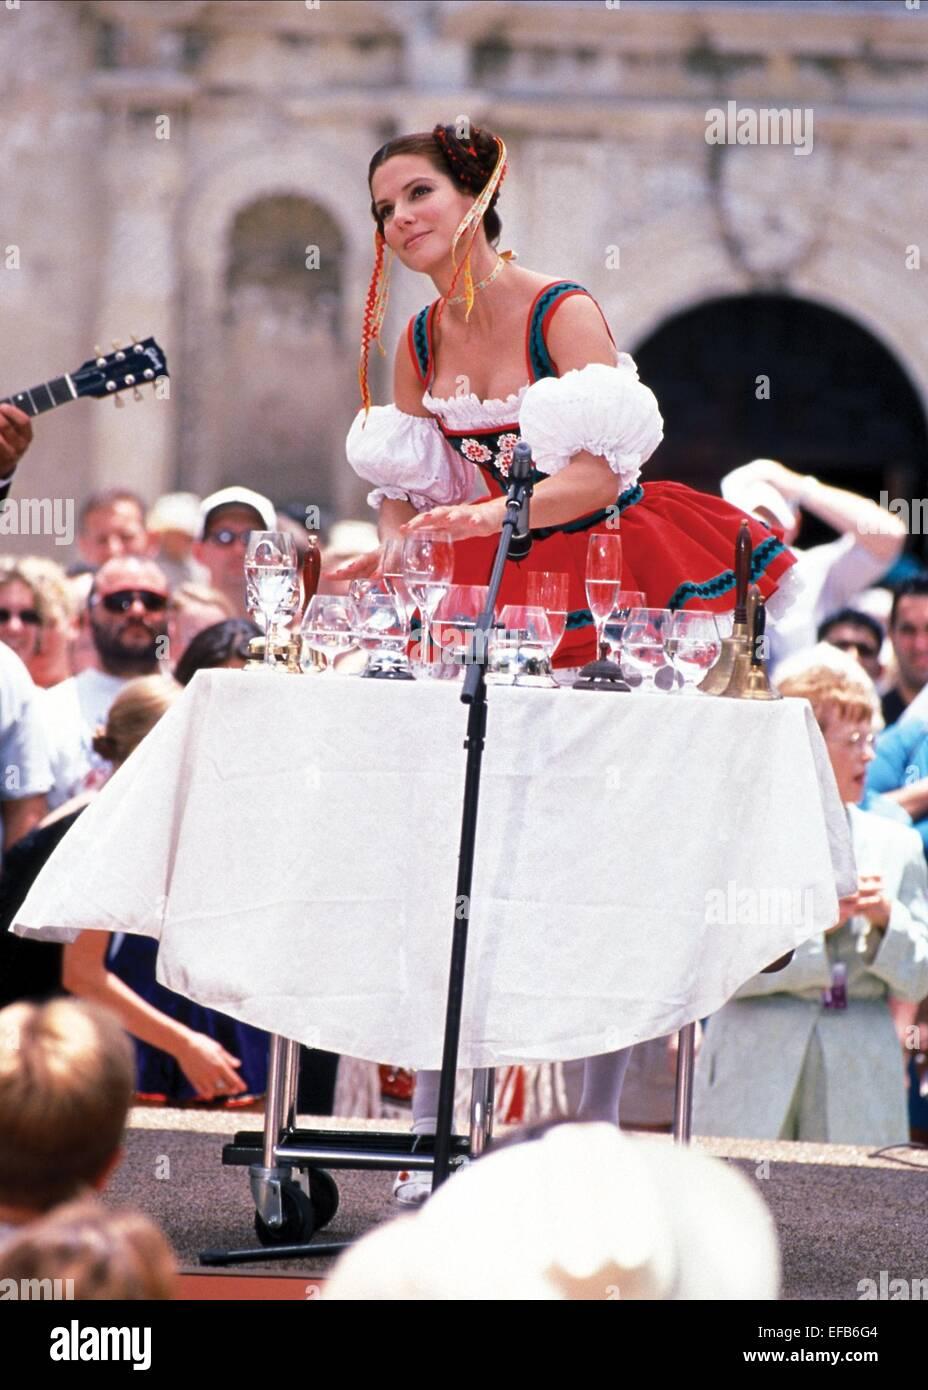 Sandra Bullock Miss Congeniality 2000 Stock Photo Alamy